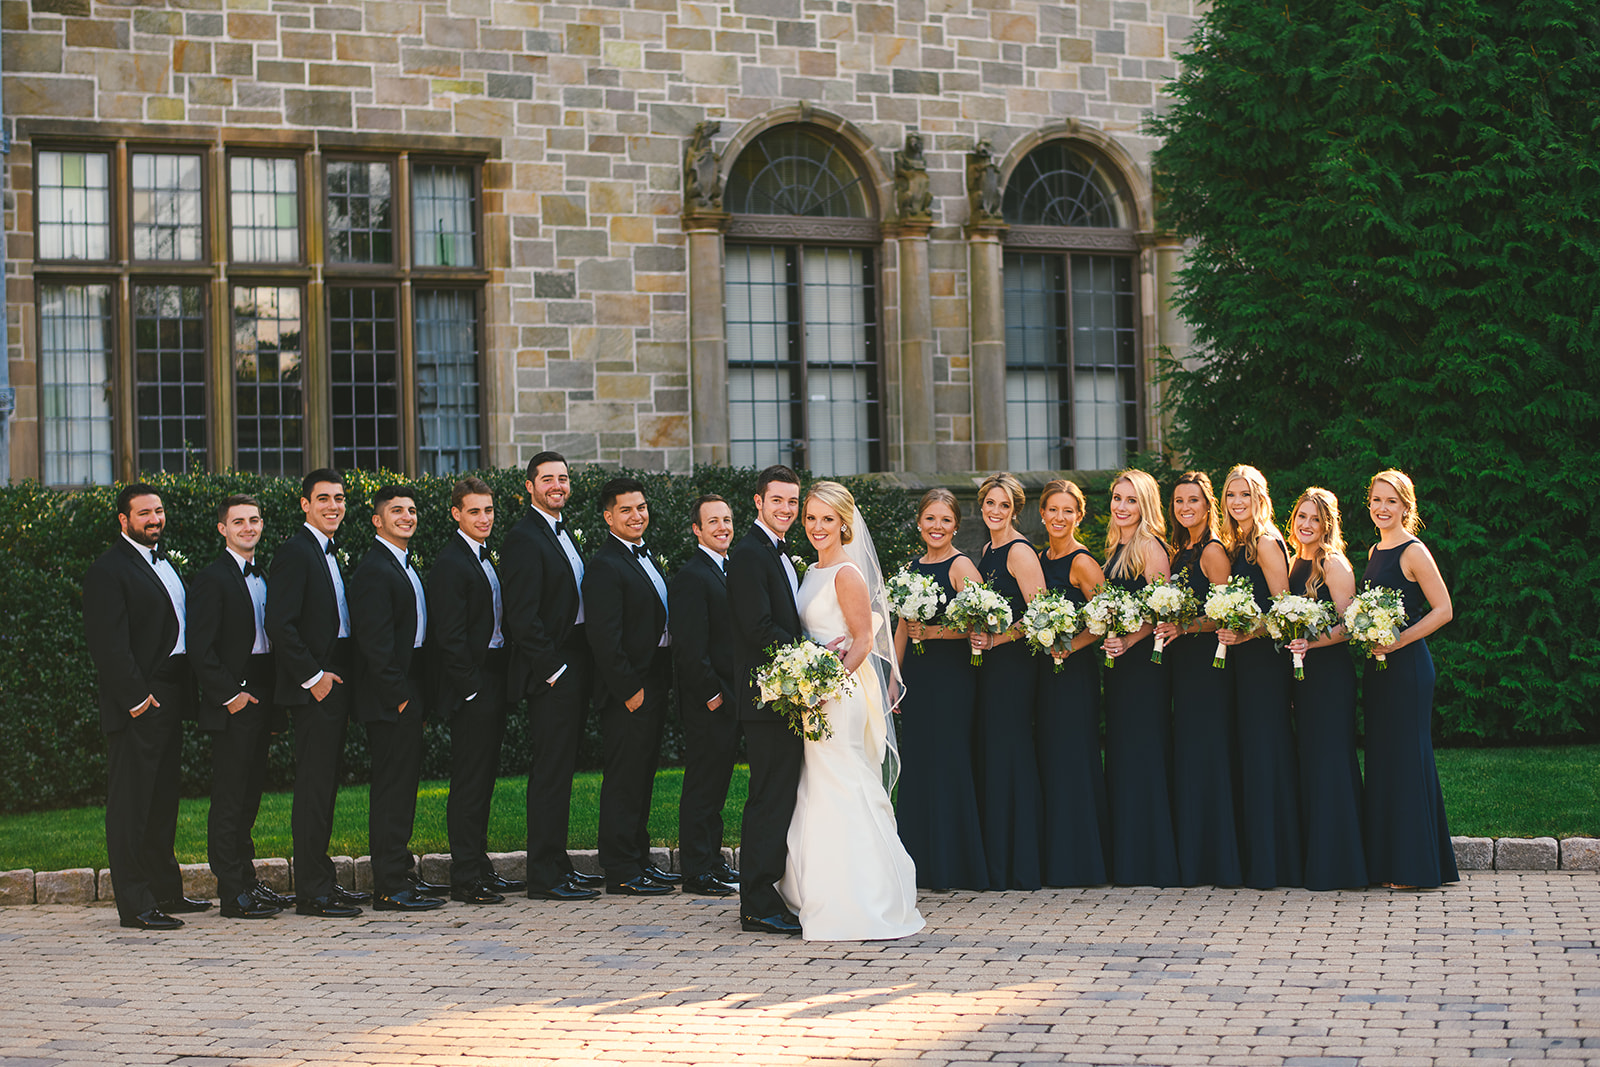 12 bridal part at Bellarmine Hall Fairfield University wedding.jpg